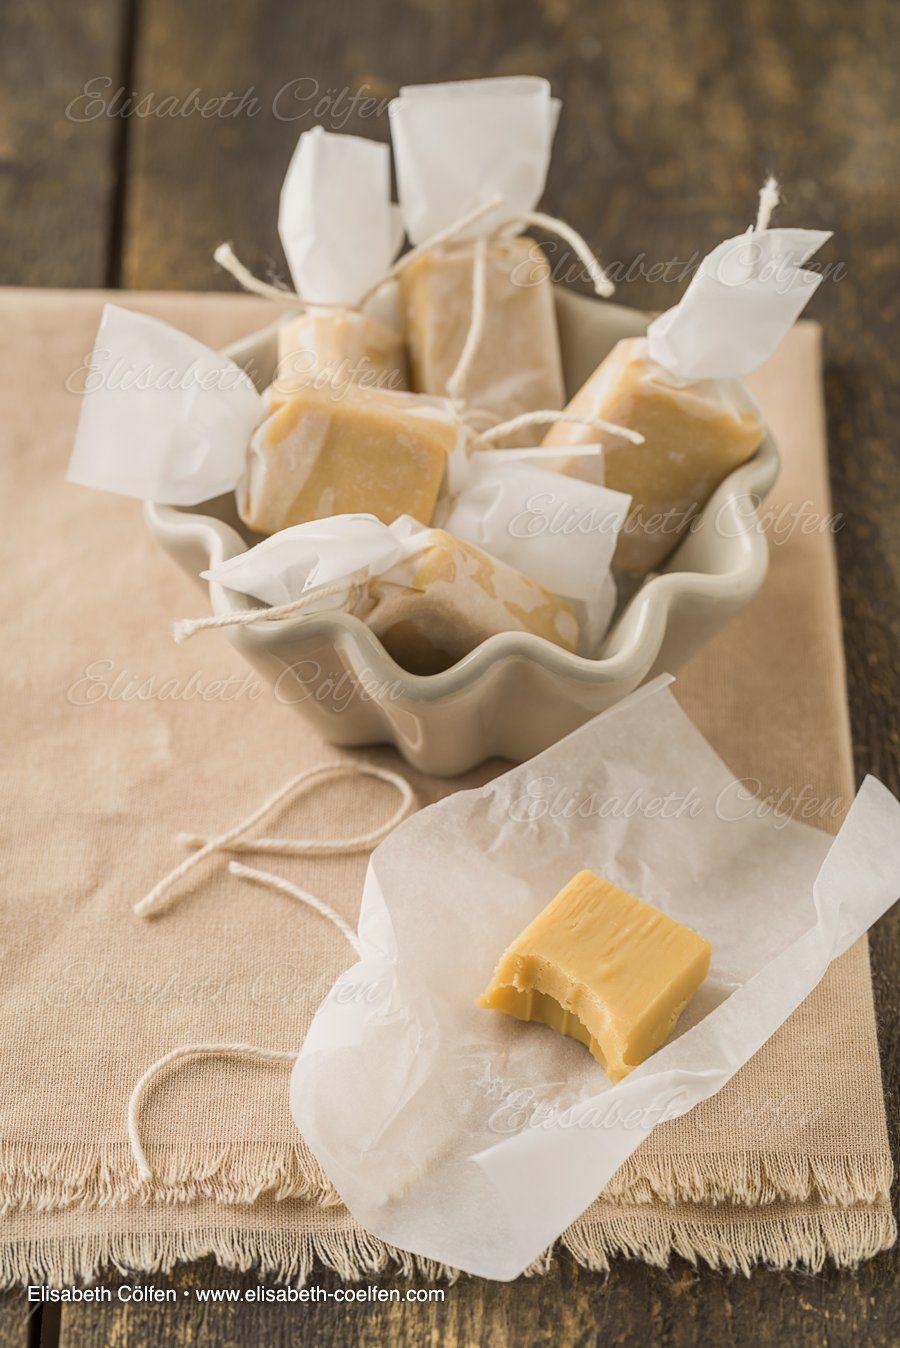 Das leckerste Karamell (Fudge) der Welt | Sweets | Pinterest ...